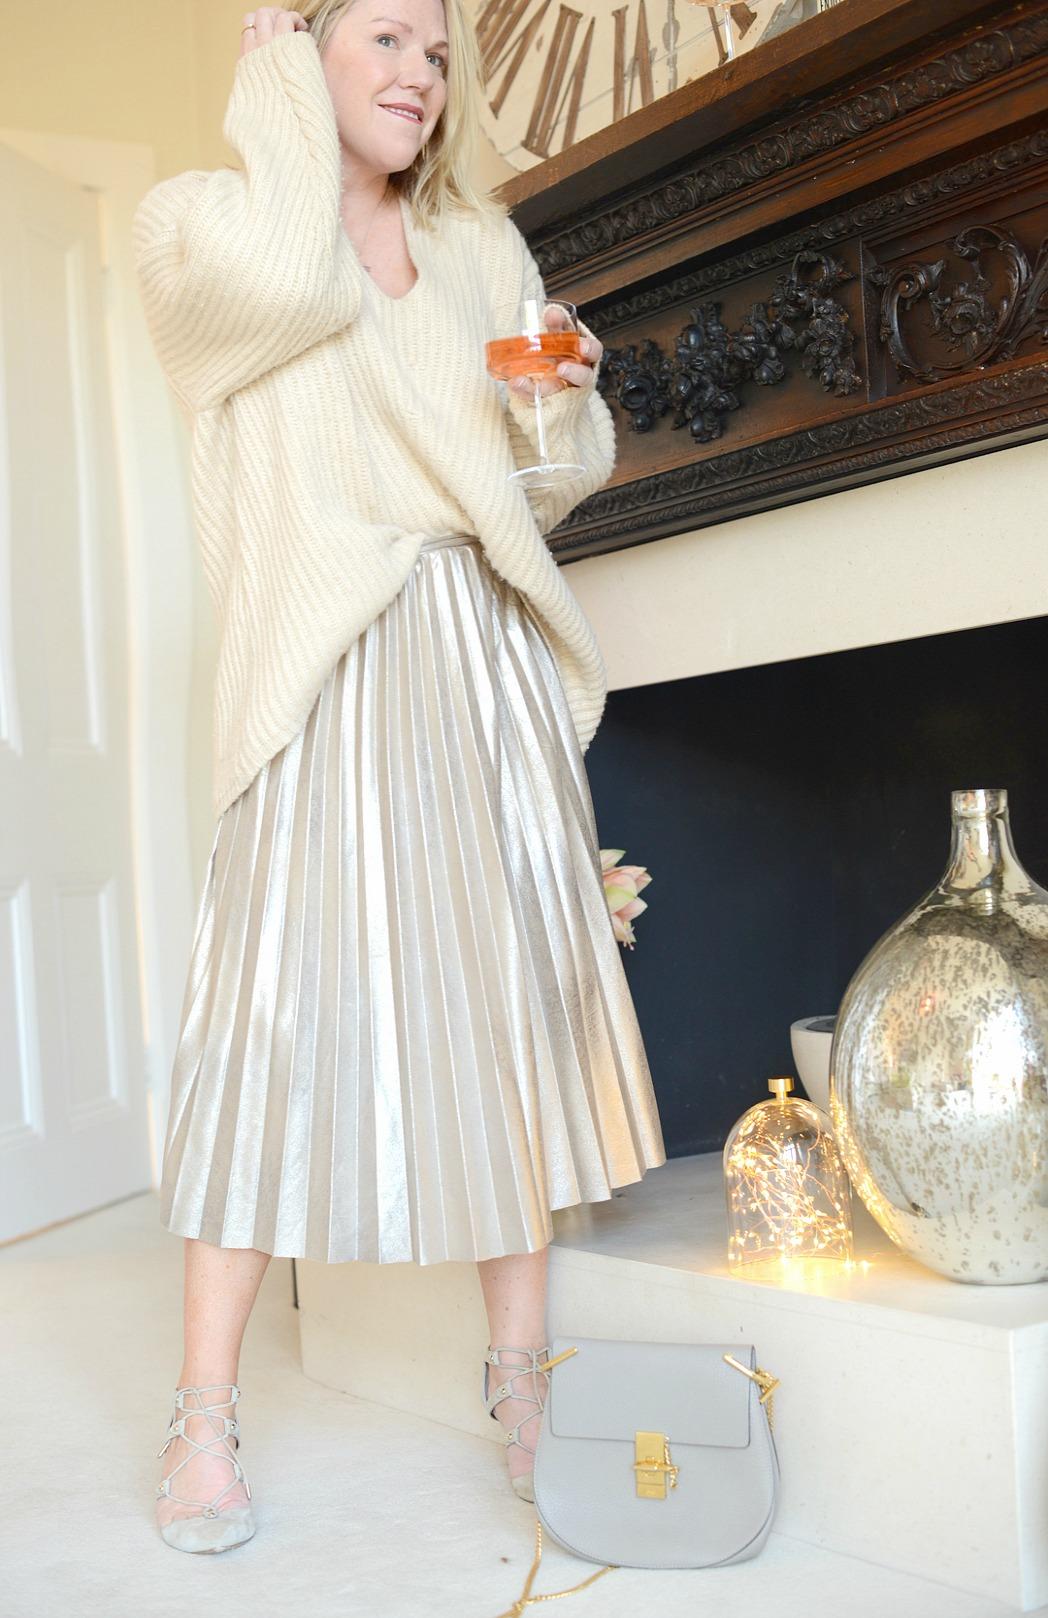 metallic zara skirt worn by fashion stylist and blogger sara delaney